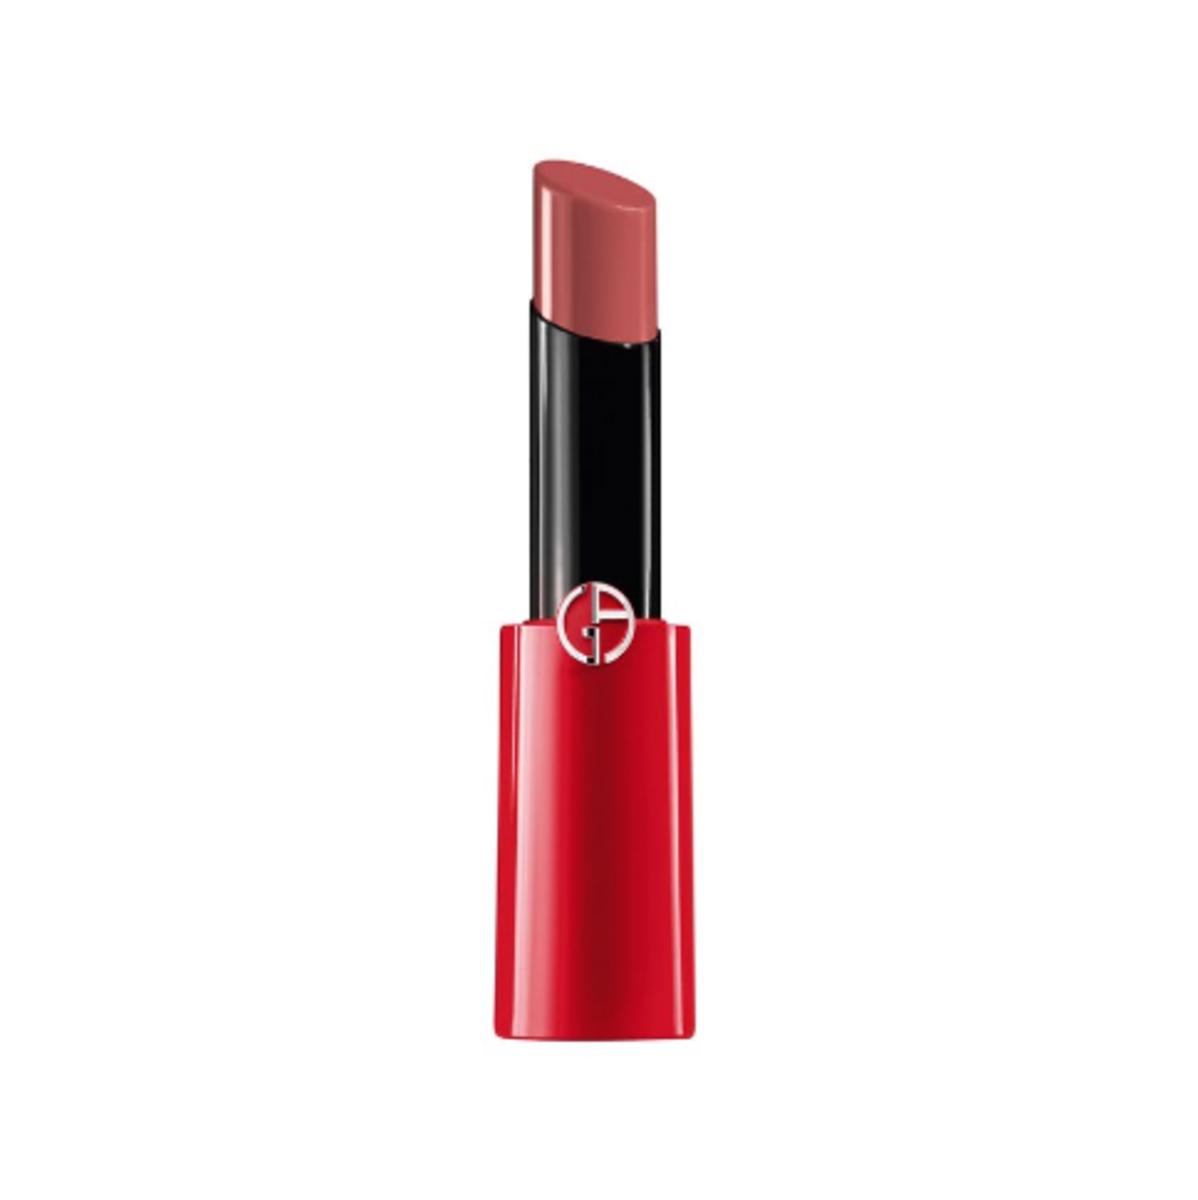 Ecstasy Shine Lip Cream 3g #100 [Parallel Import]